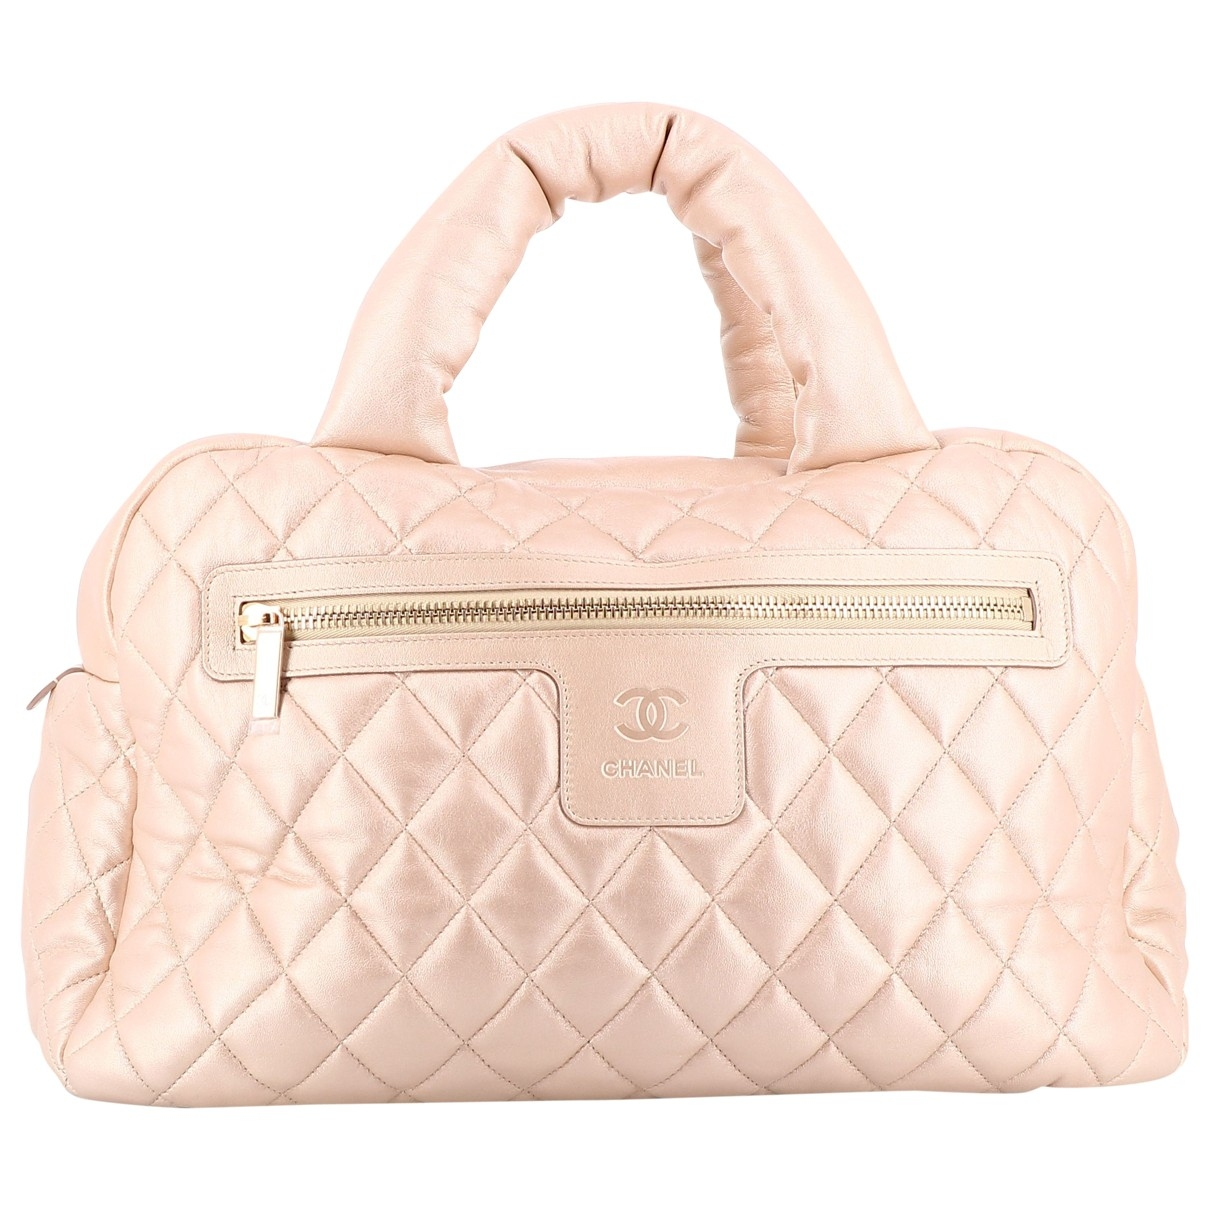 Chanel Coco Cocoon Beige Leather handbag for Women \N